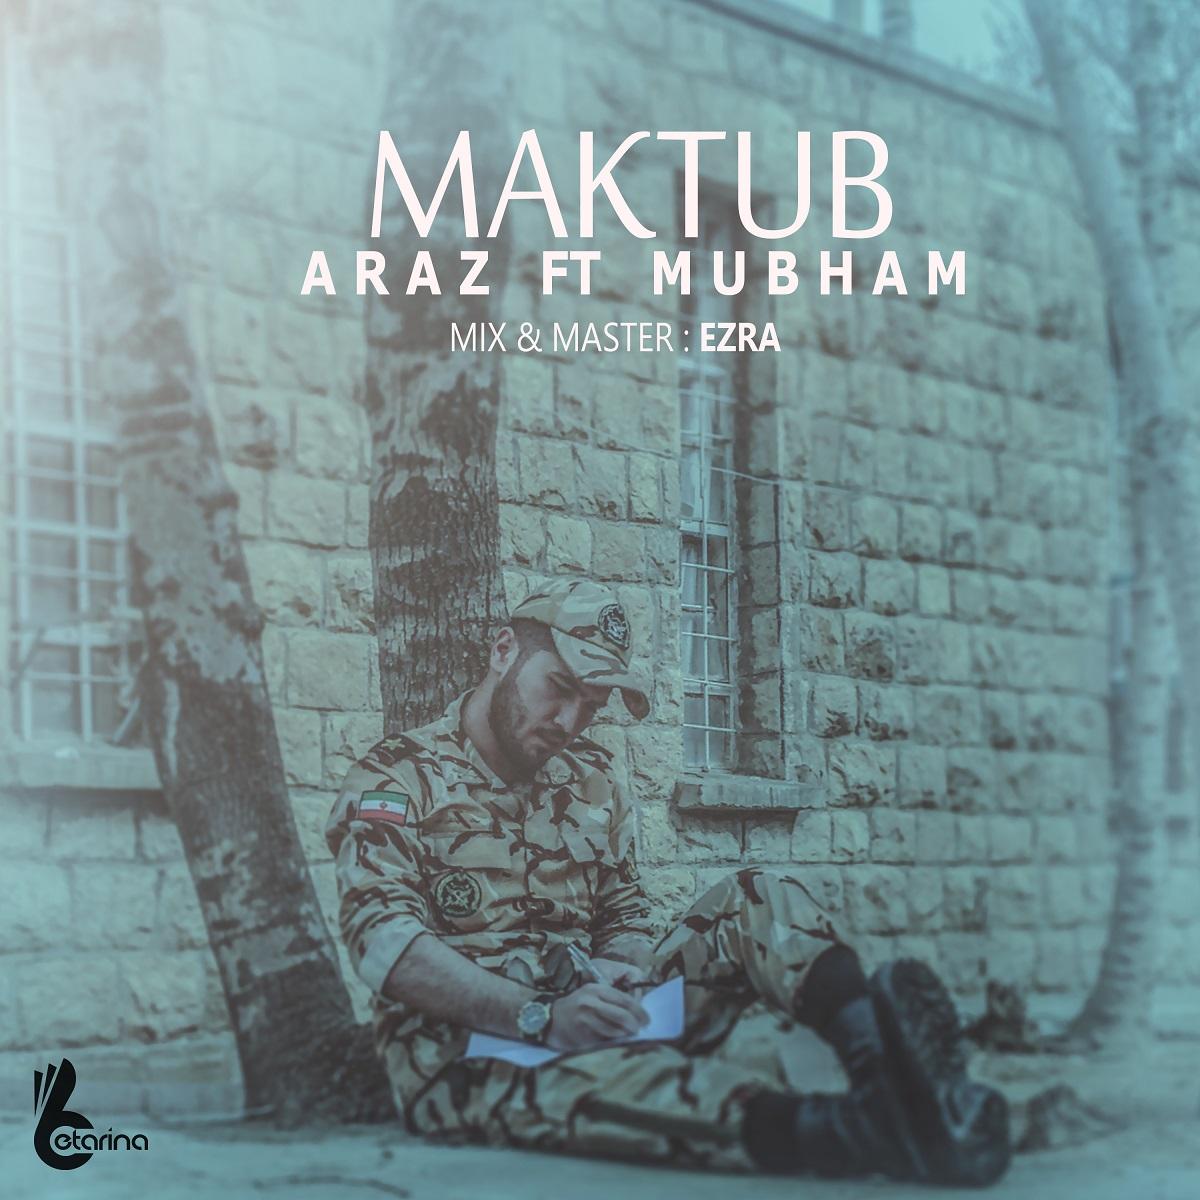 Araz Ft Mubham - Maktub